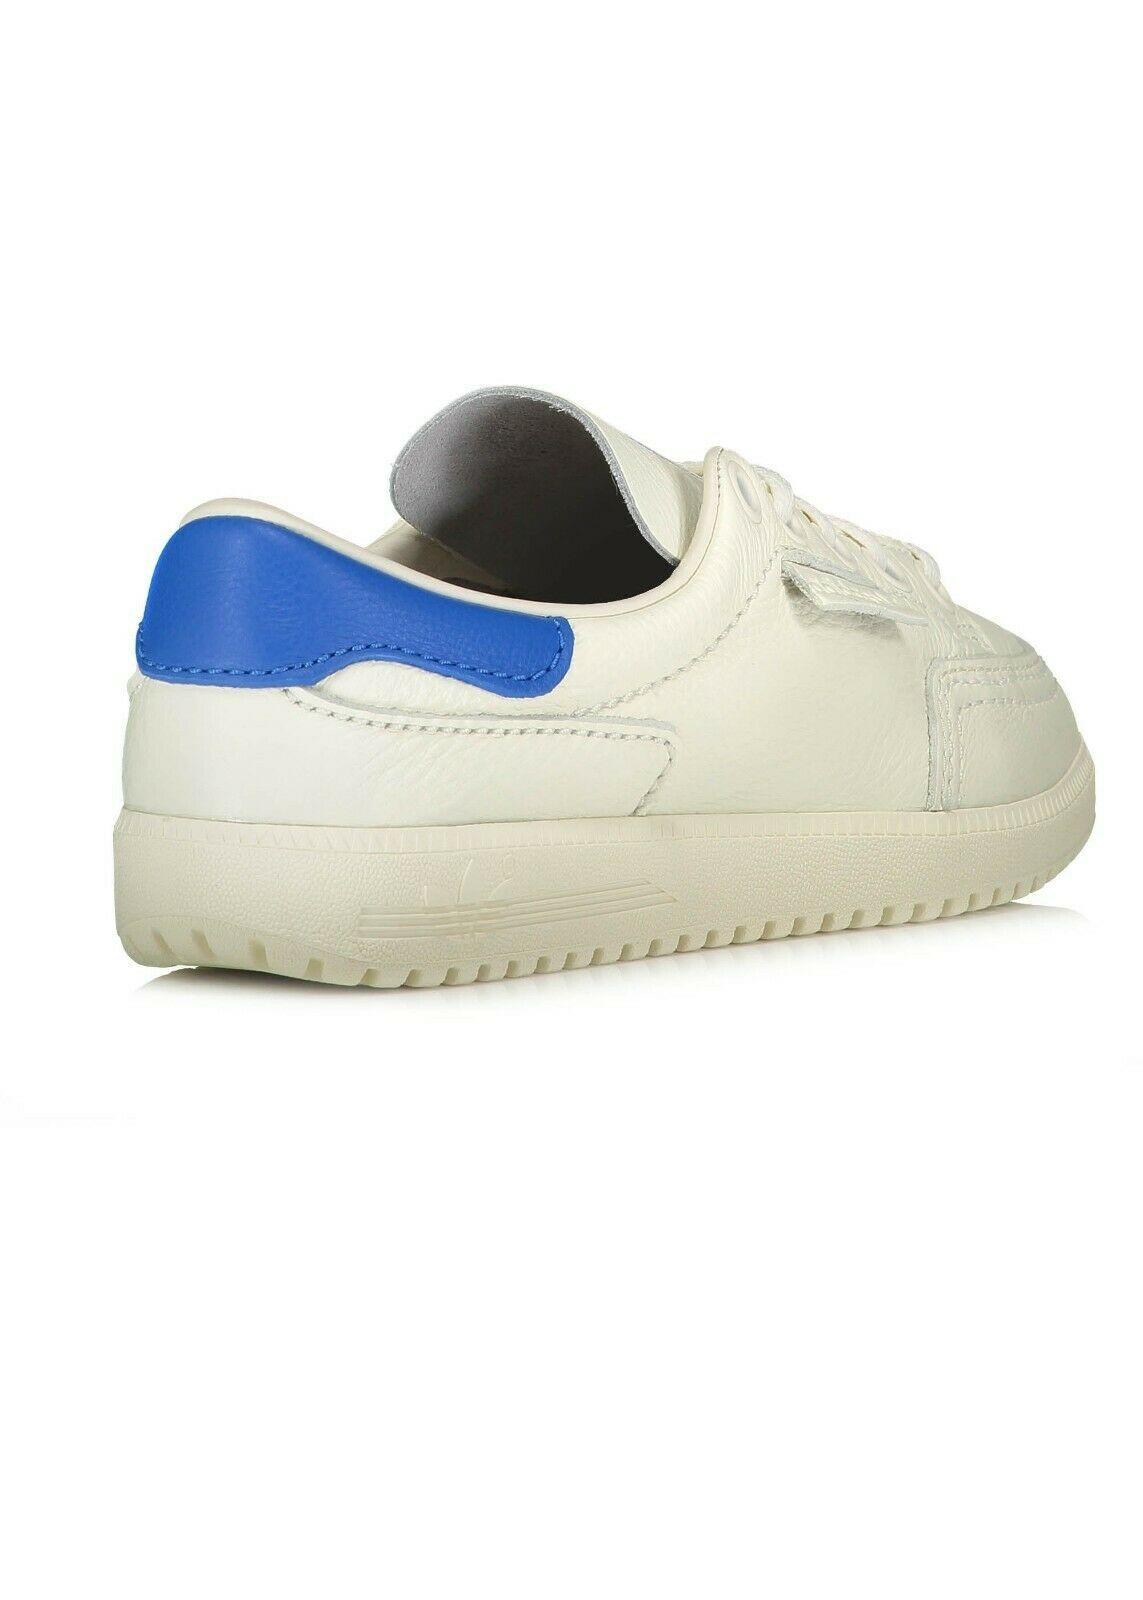 Adidas Originals Spezial Garwen x Union Leather B41825 Mens Sneakers image 4